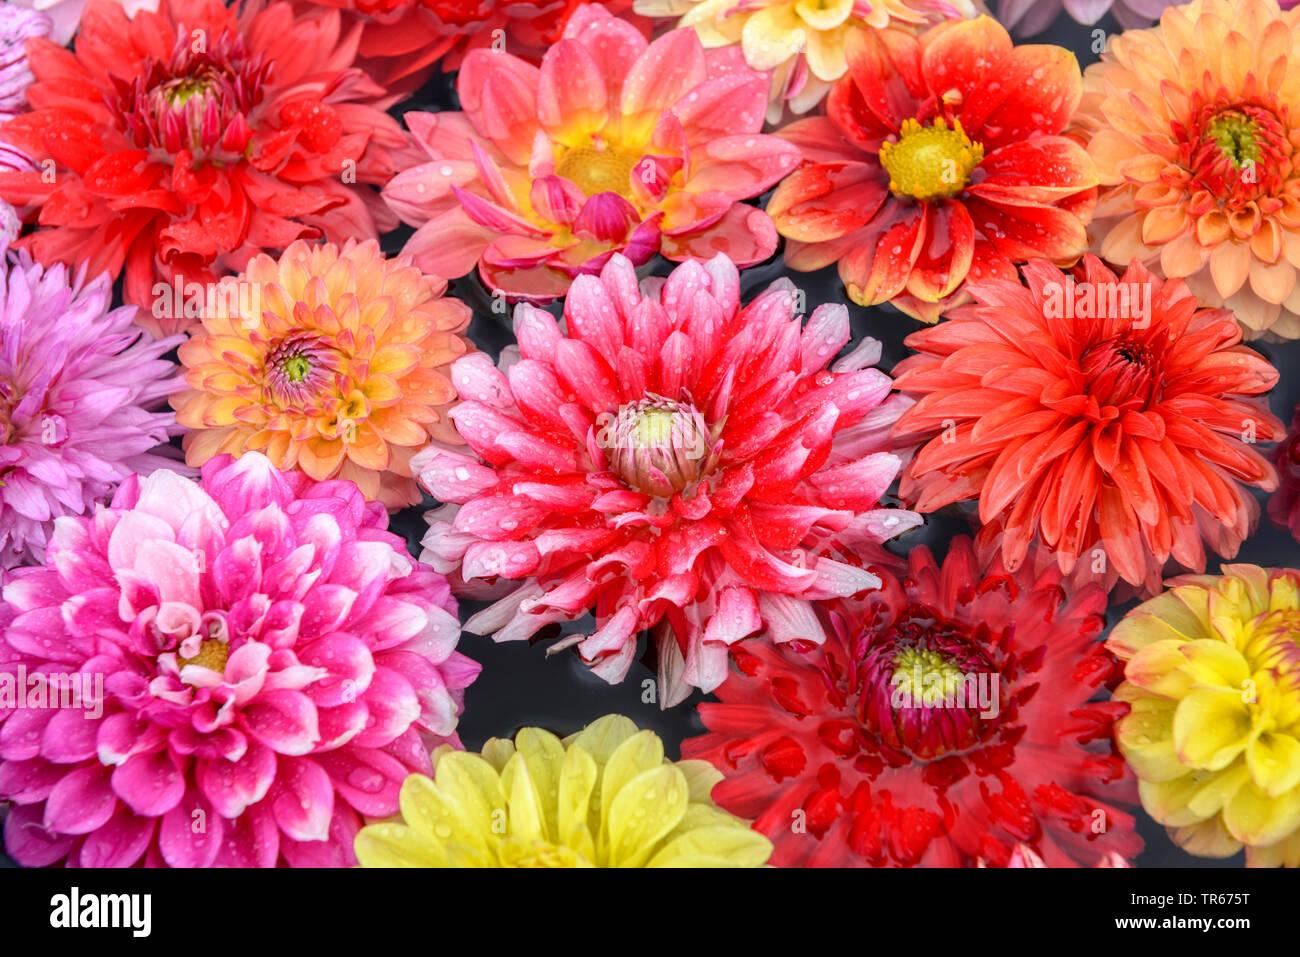 Dahlie (Dahlia spec.), Blumenteppich aus bunten Dahlienblueten auf einem Tisch   georgina (Dahlia spec.), colourful georgina flowers on a desk   BLWS4 - Stock Image